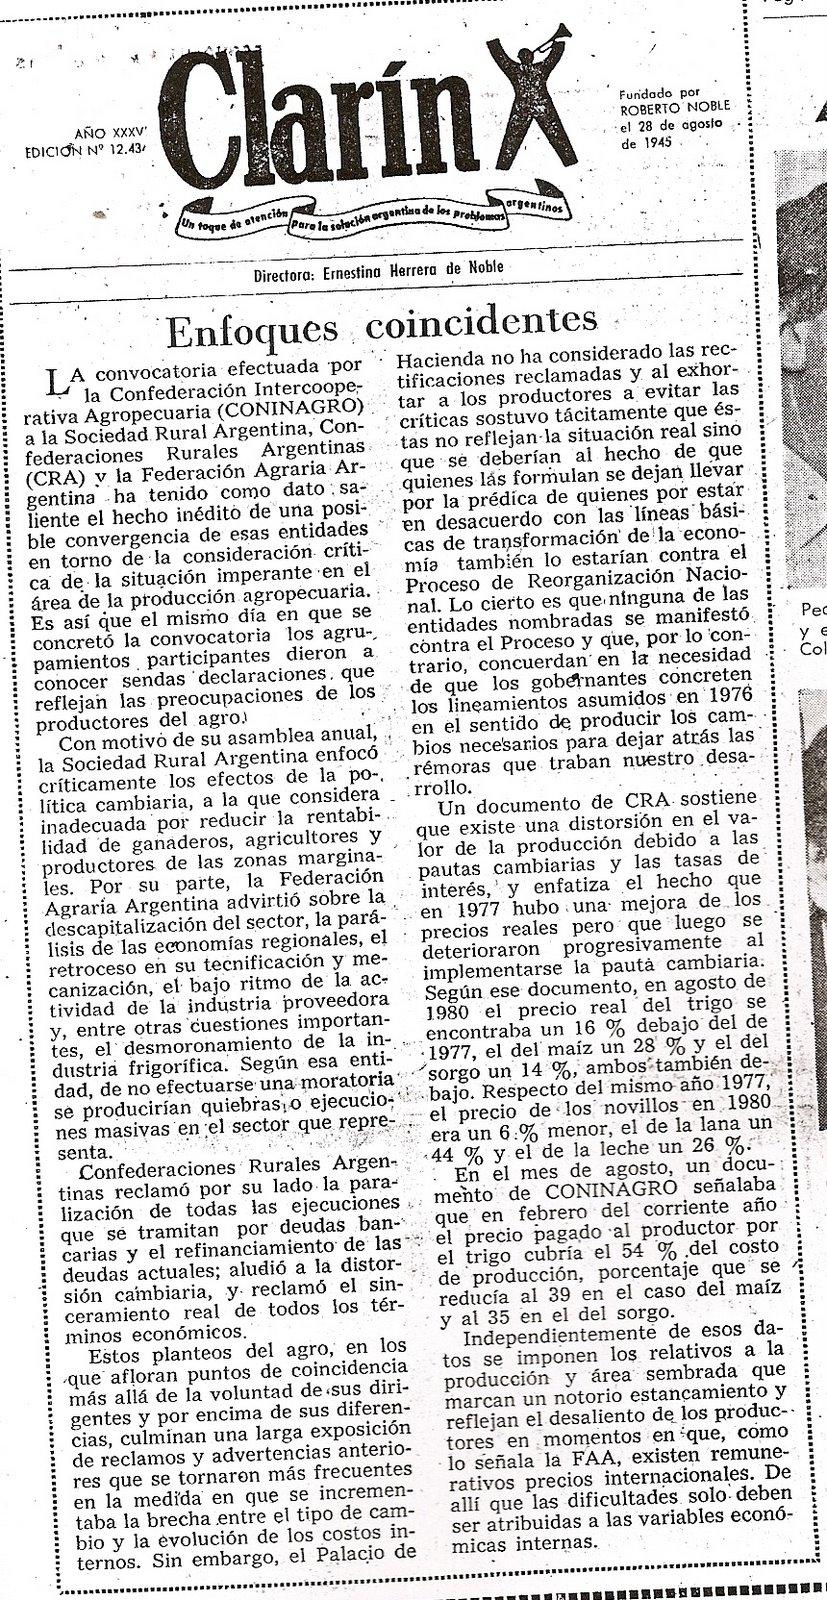 [=?iso-8859-1?Q?Editorial_Diario_Clar=EDn_6-10-1980-780731.jpg?=]